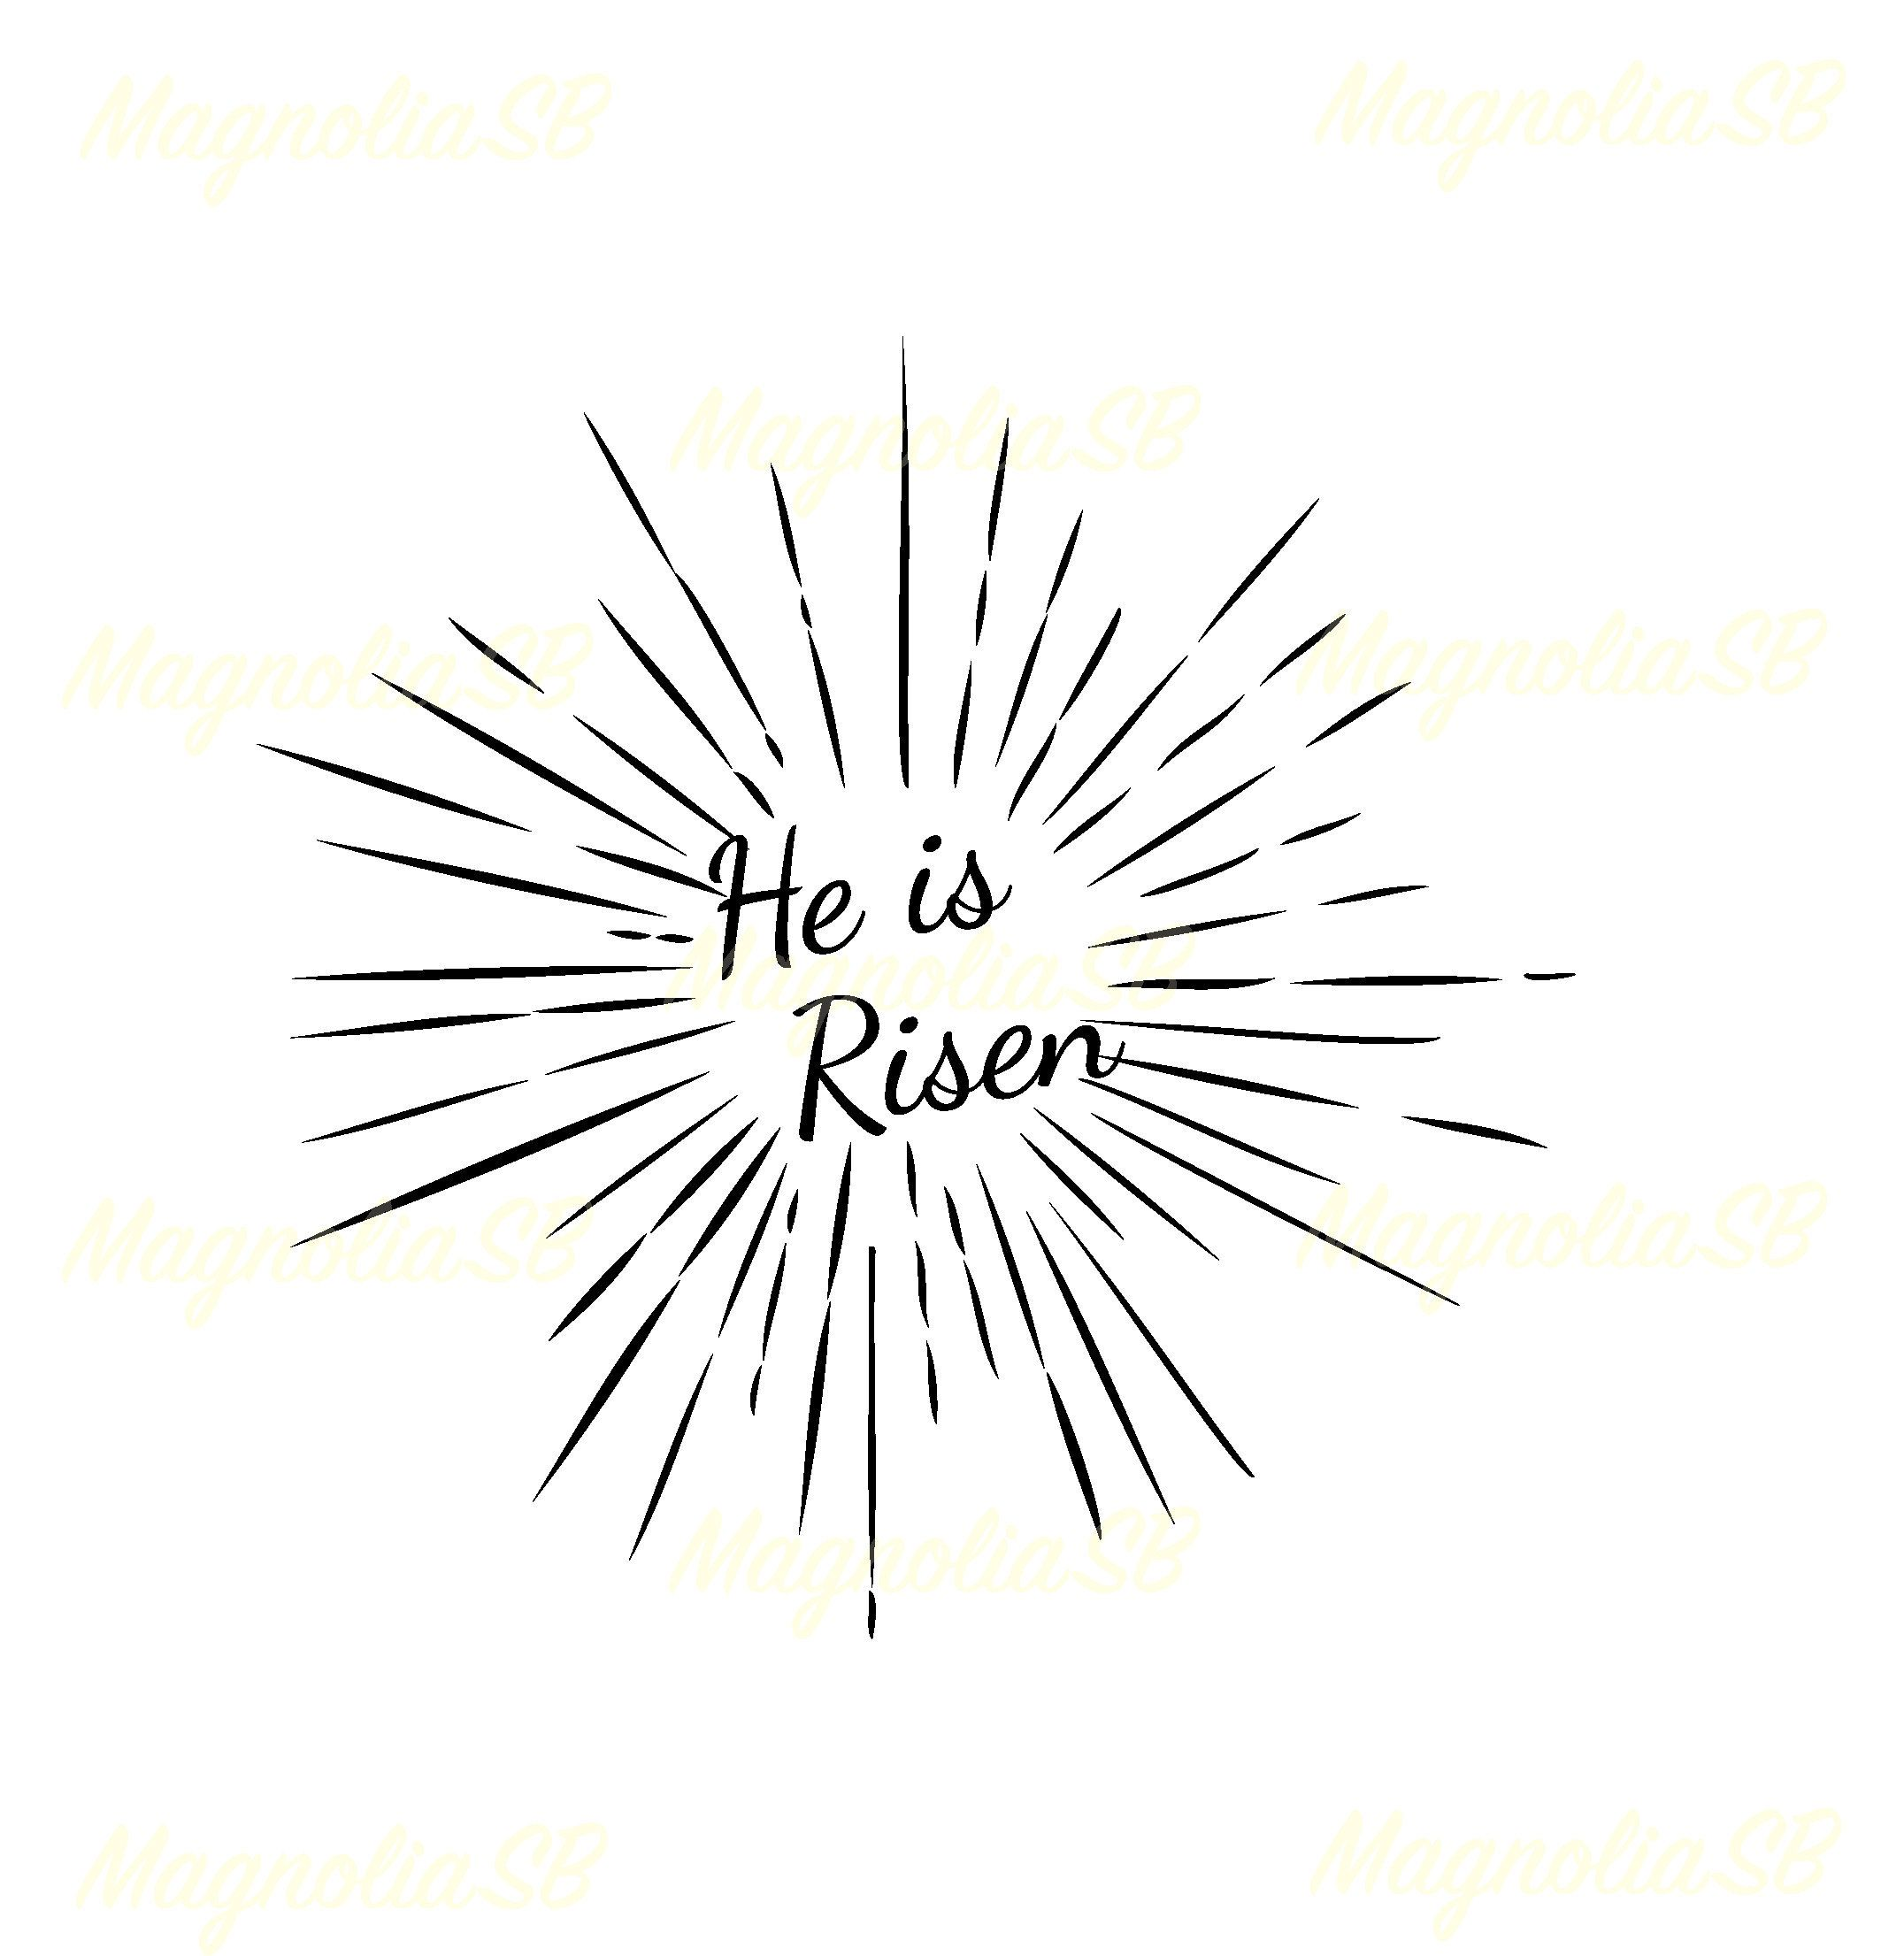 medium resolution of he is risen svg he is risen dxf he is risen clipart cutting he is risen vector he is risen shape easter rays he is risen silhouette